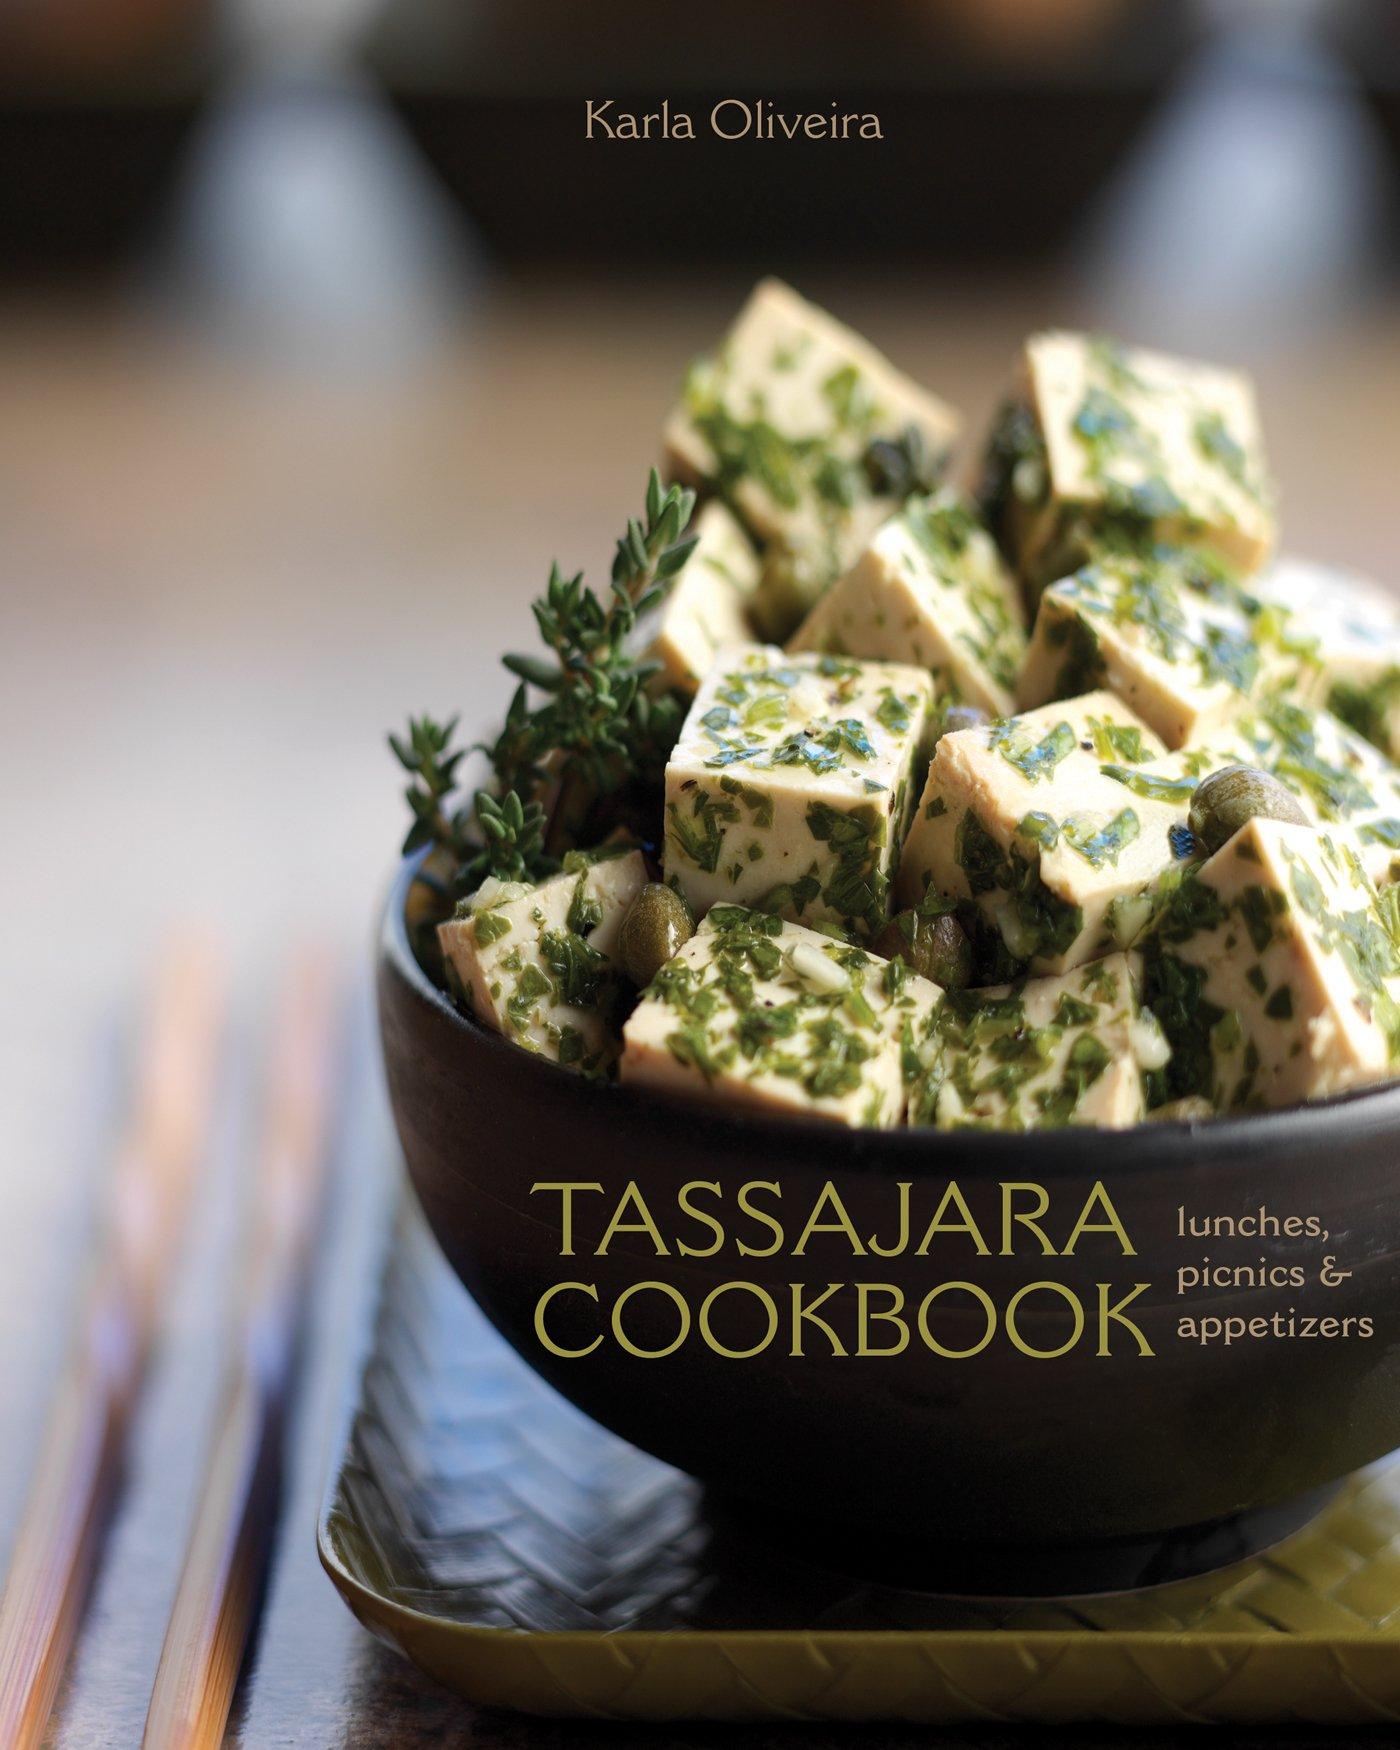 Tassajara Cookbook Lunches Picnics Appetizers product image